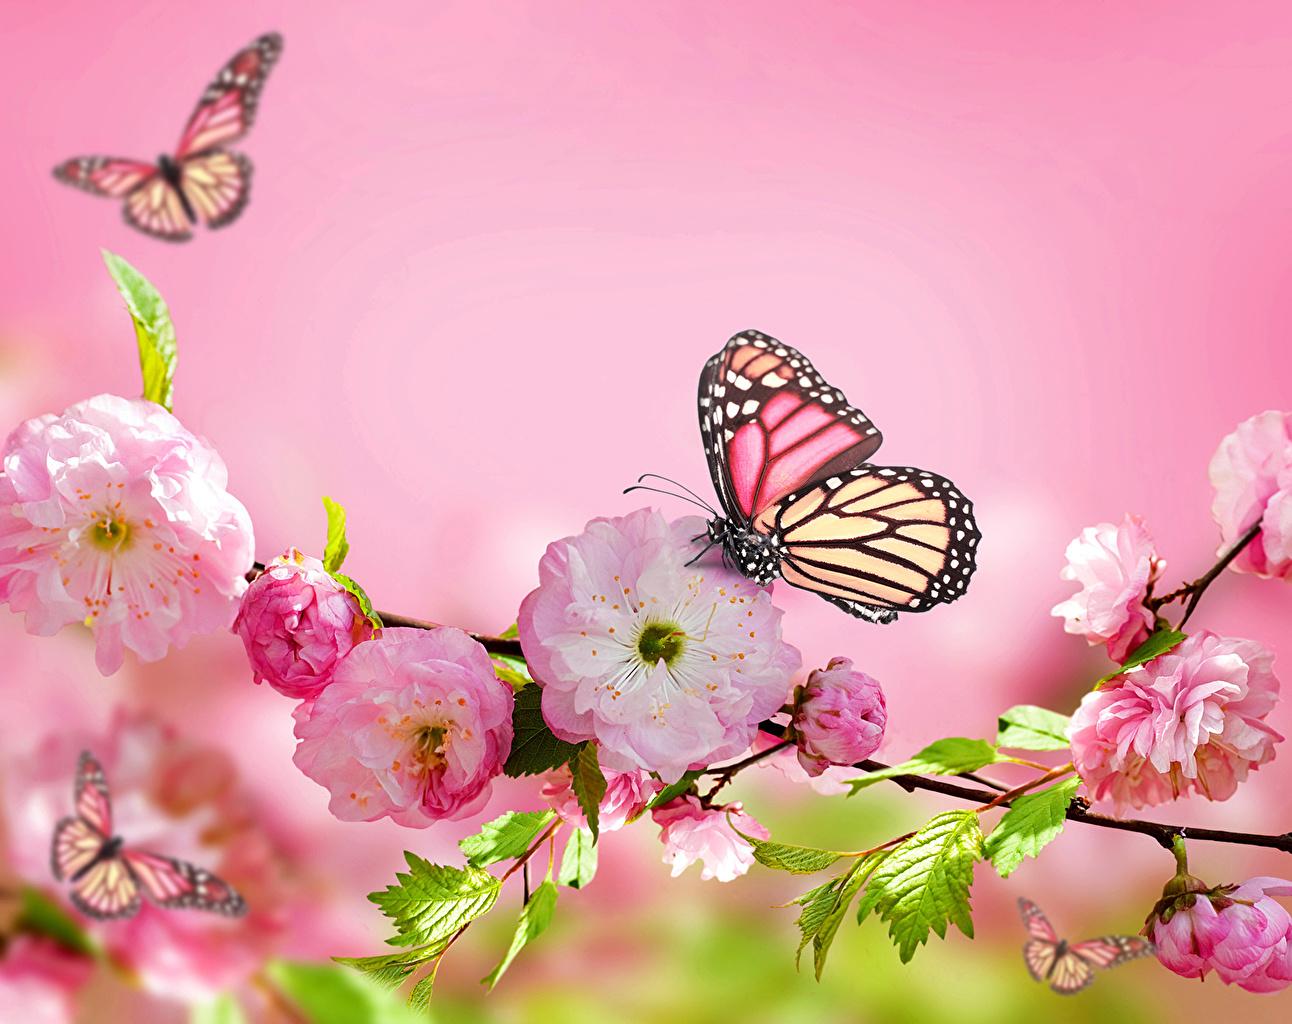 Фото Данаида монарх Бабочки цветок Цветущие деревья бабочка Цветы